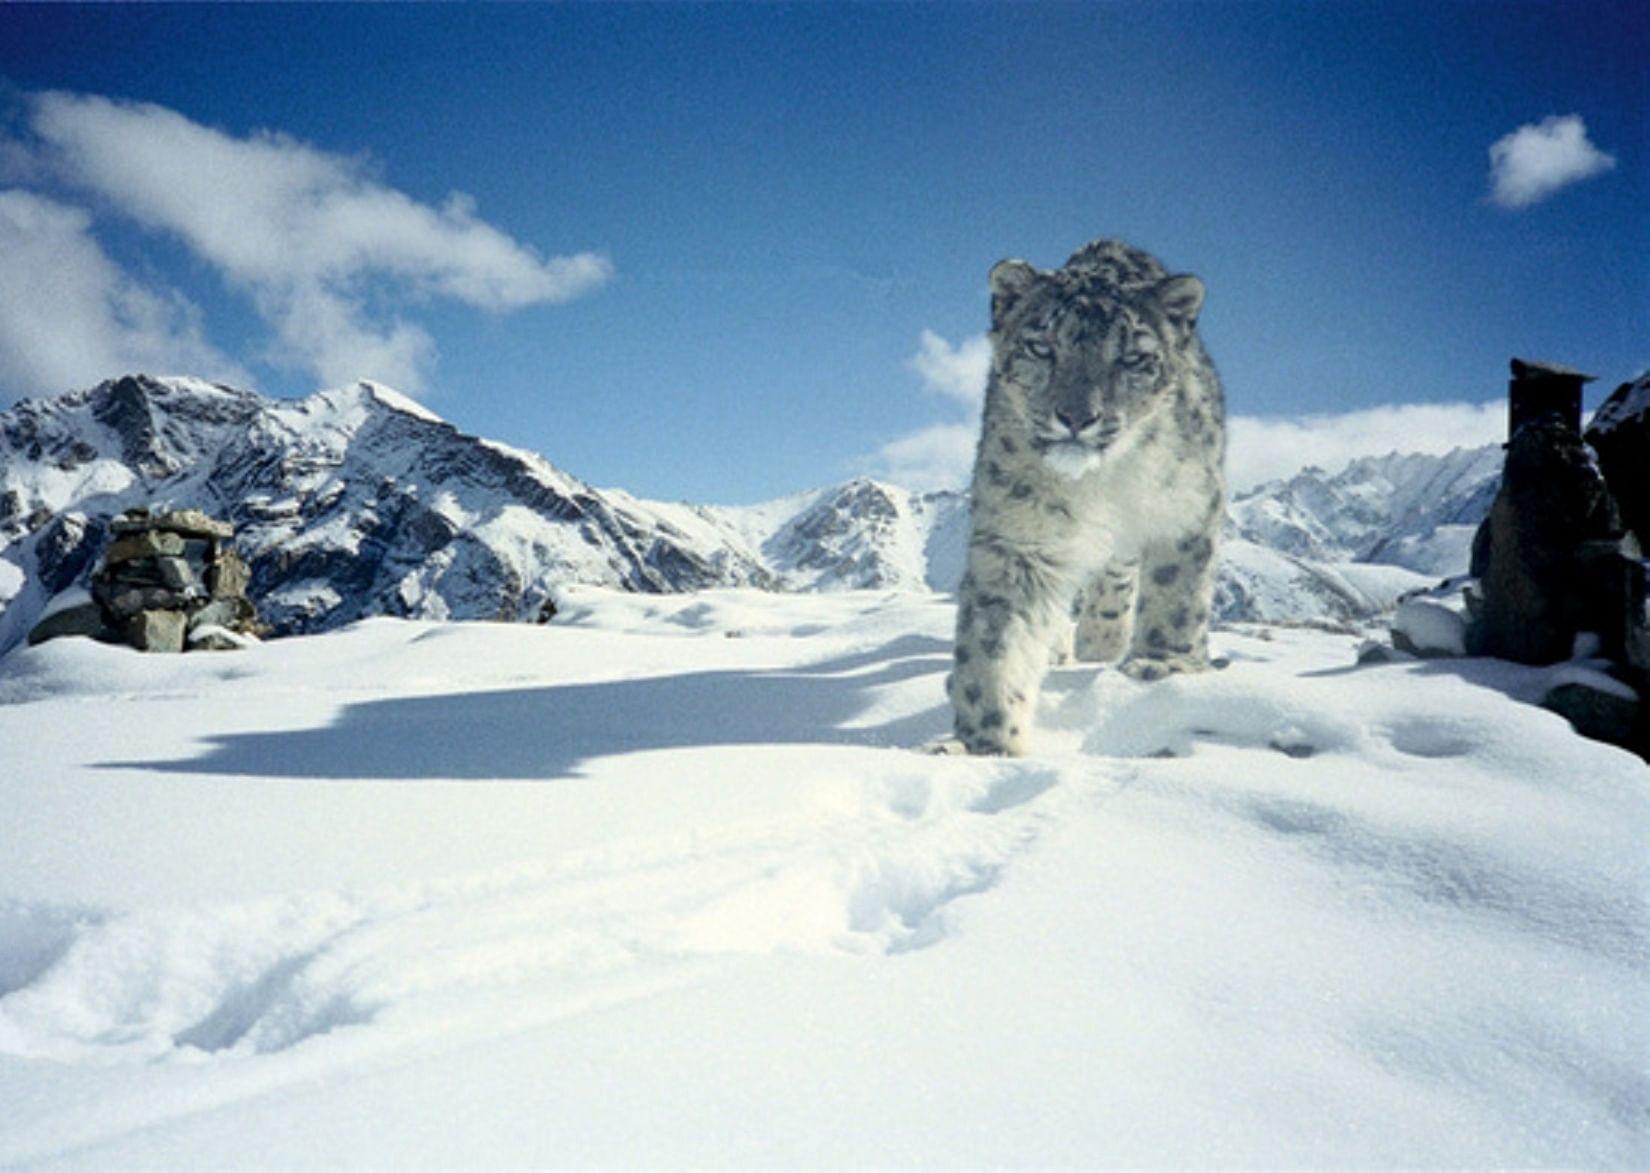 Snow leopard at Hemis National Park, India